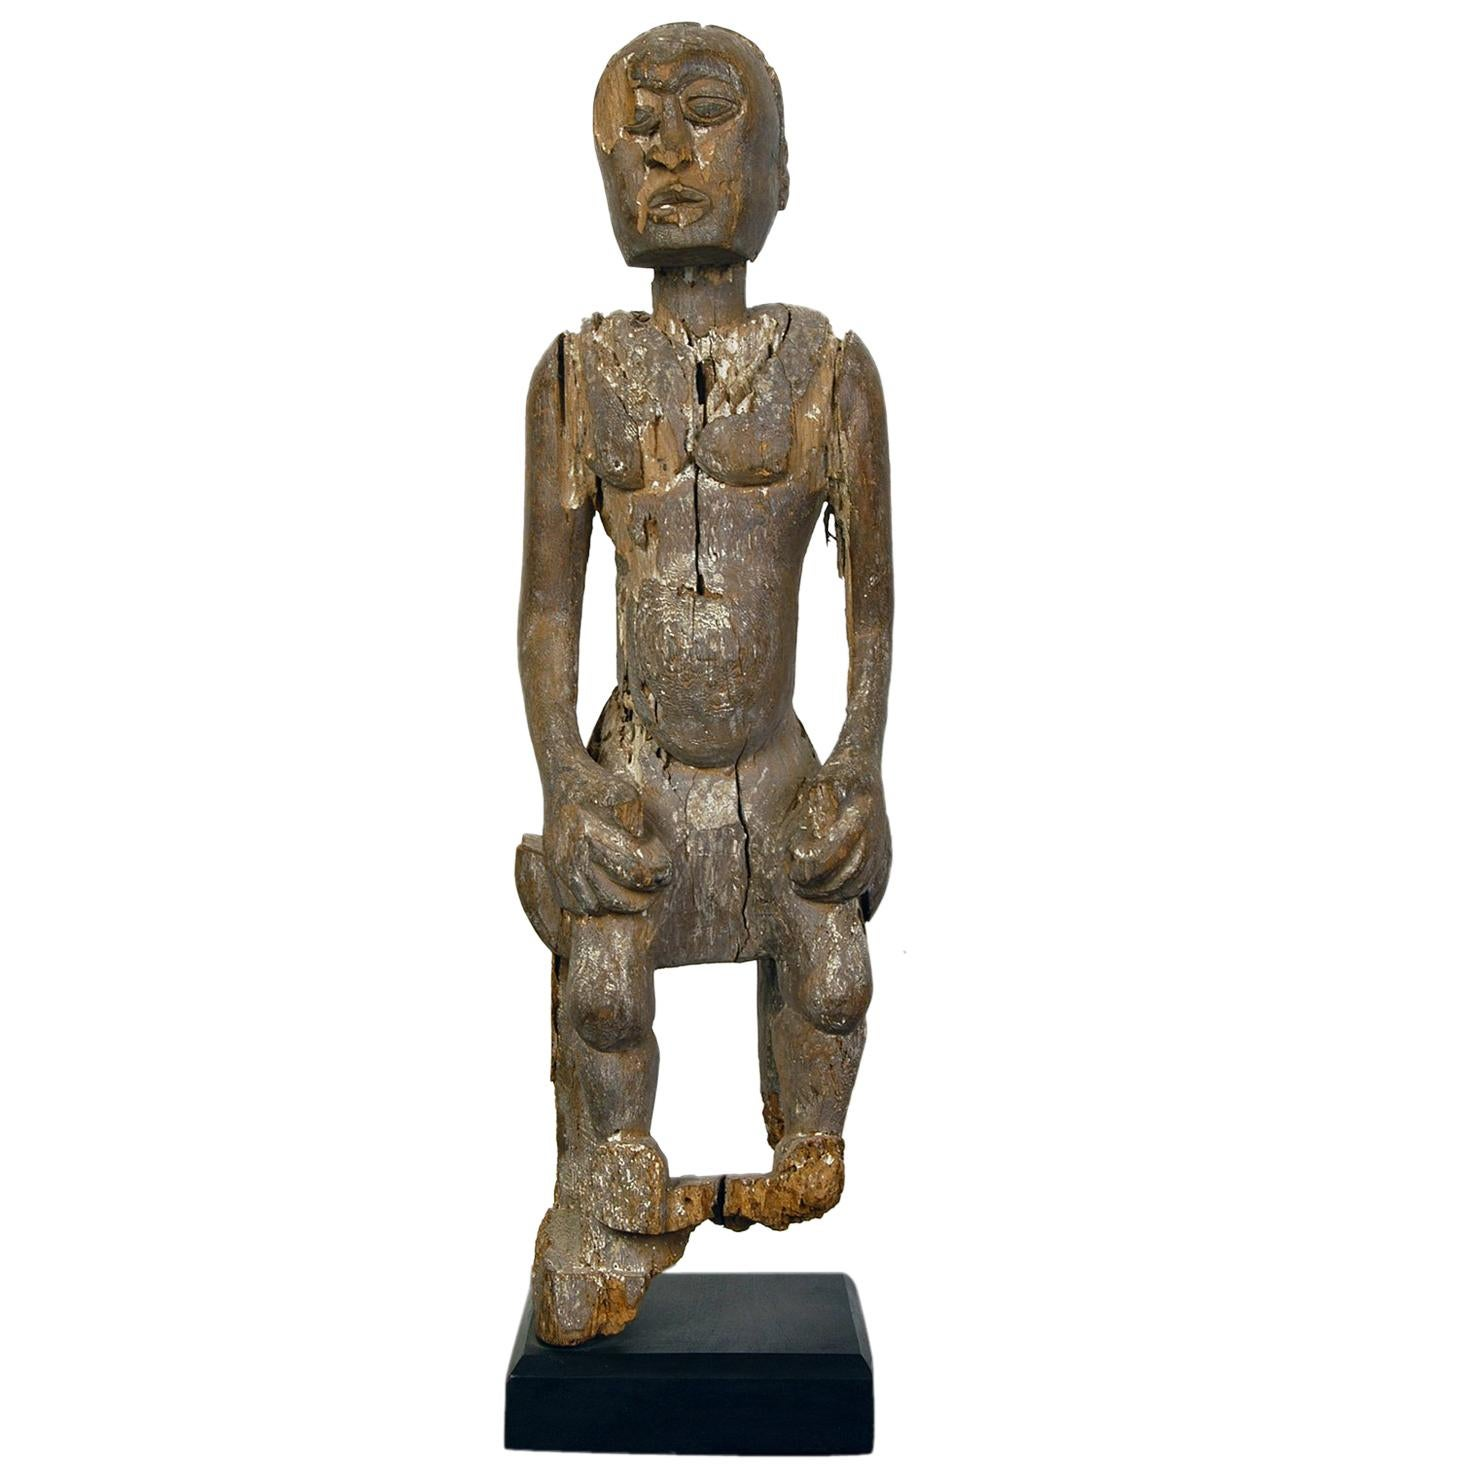 Antique Carved Wood Folk Art Decorative Sculpture Statue Man on Ebonised Plinth